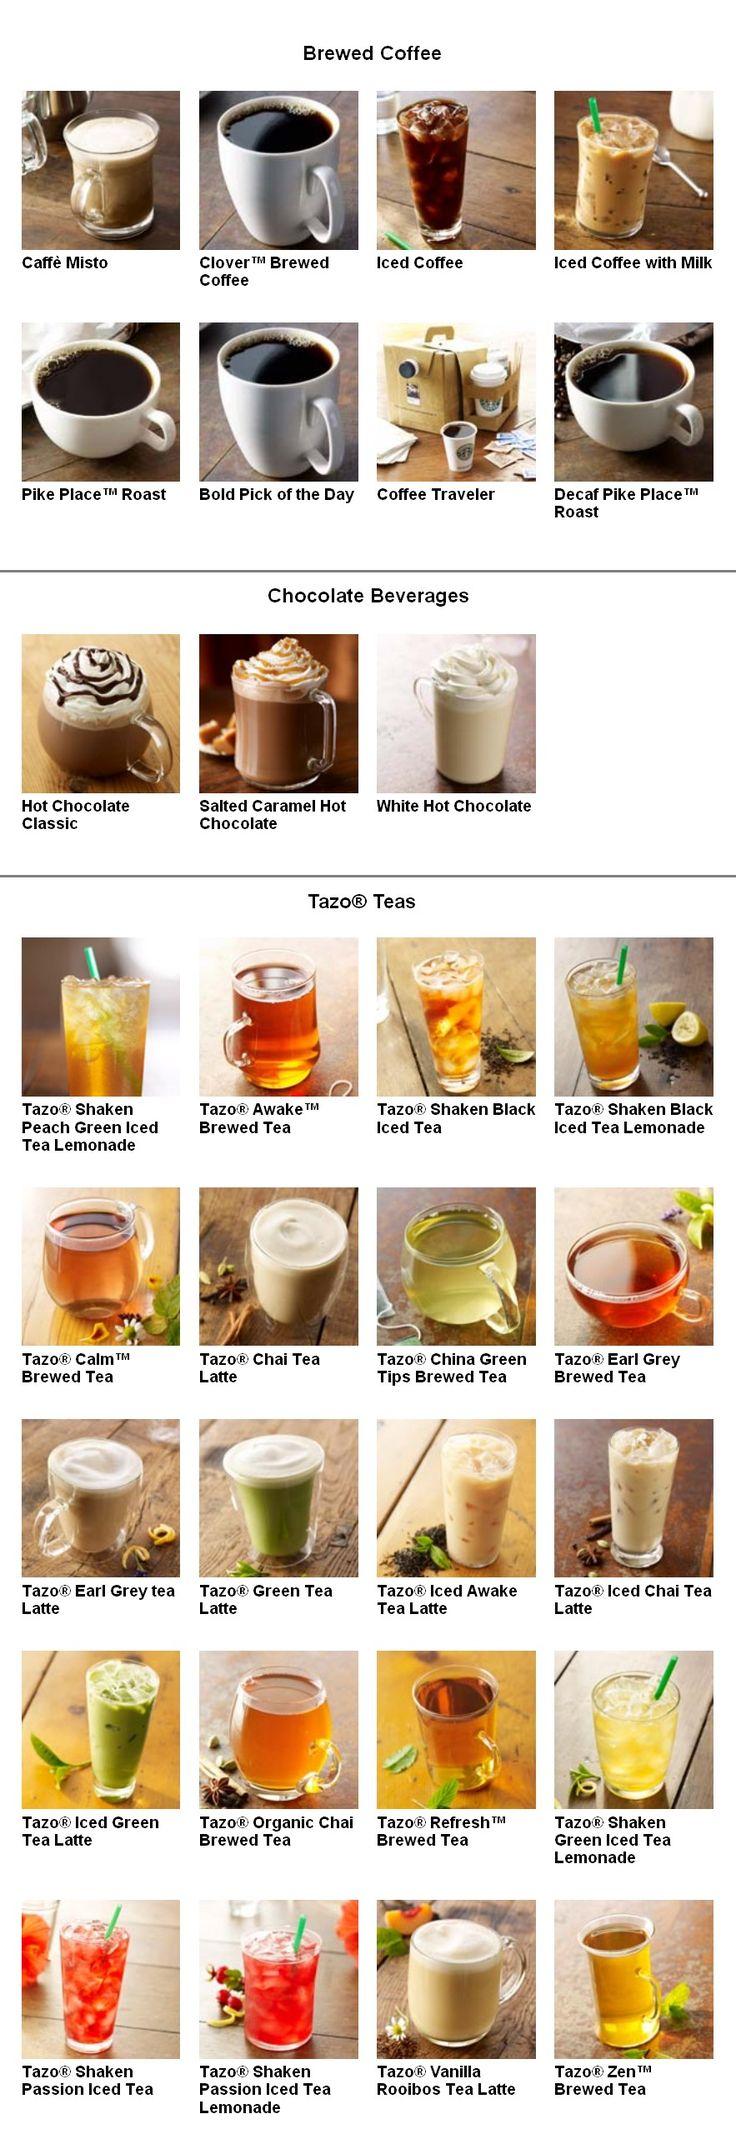 #2) Starbucks Drink Menu